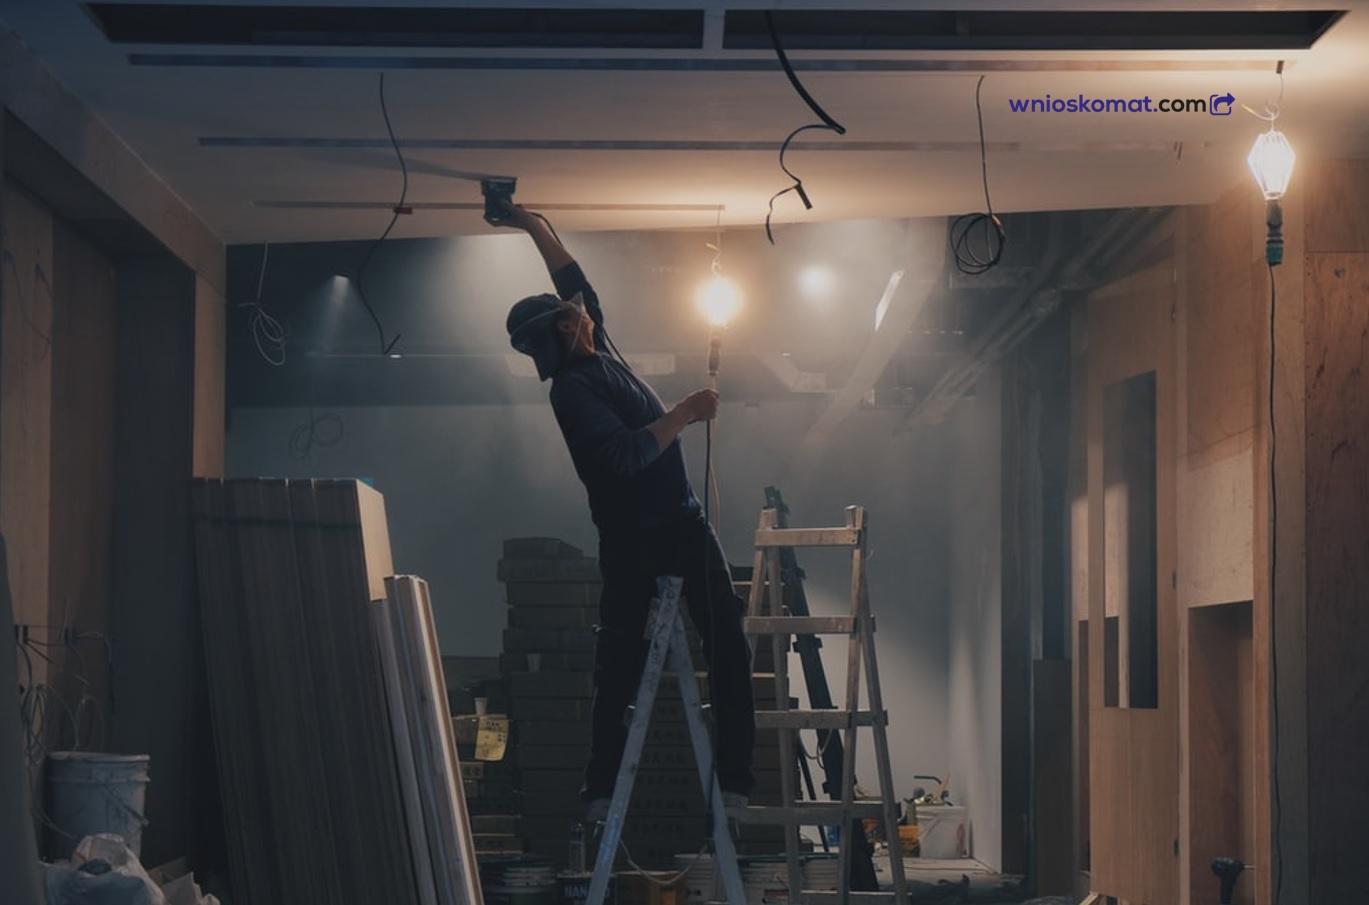 remont domu rozliczenie kredytu